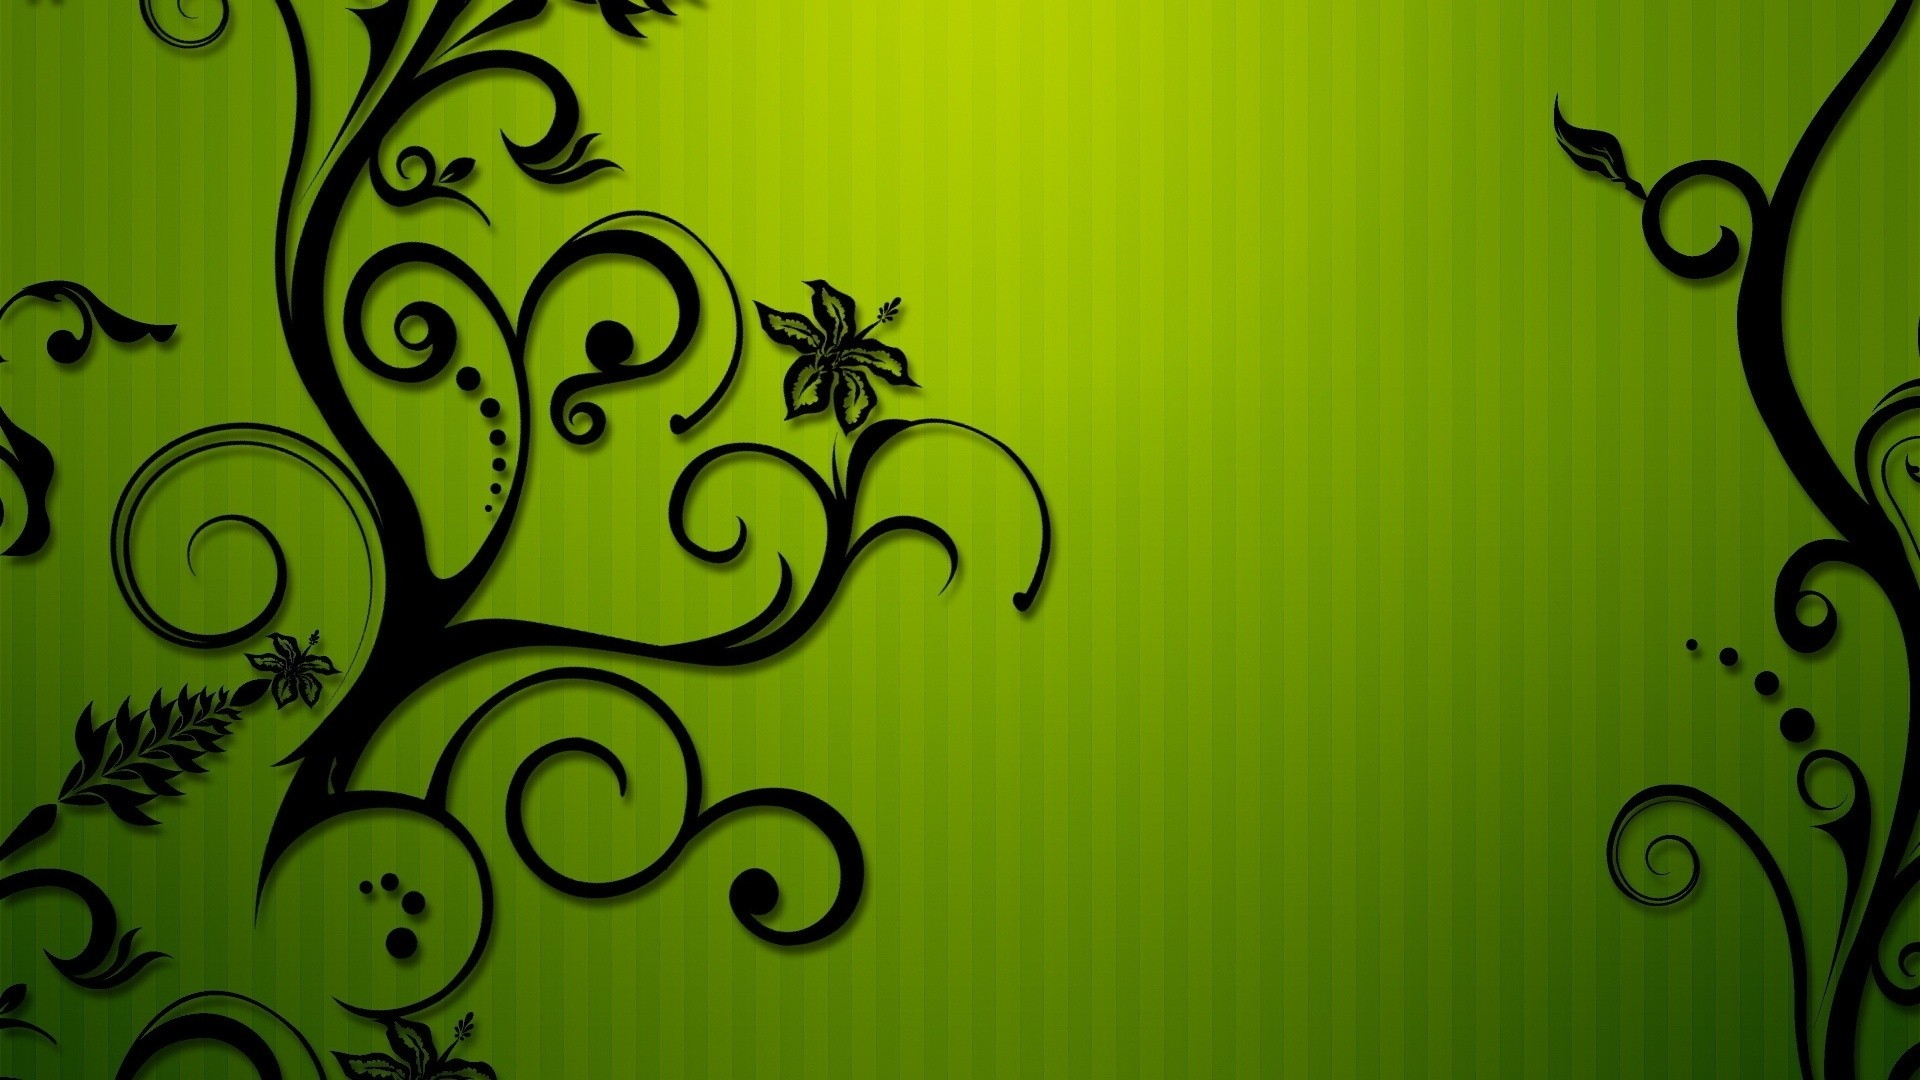 Floral full hd fond d 39 cran and arri re plan 1920x1080 for Esteban paredes wallpaper hd